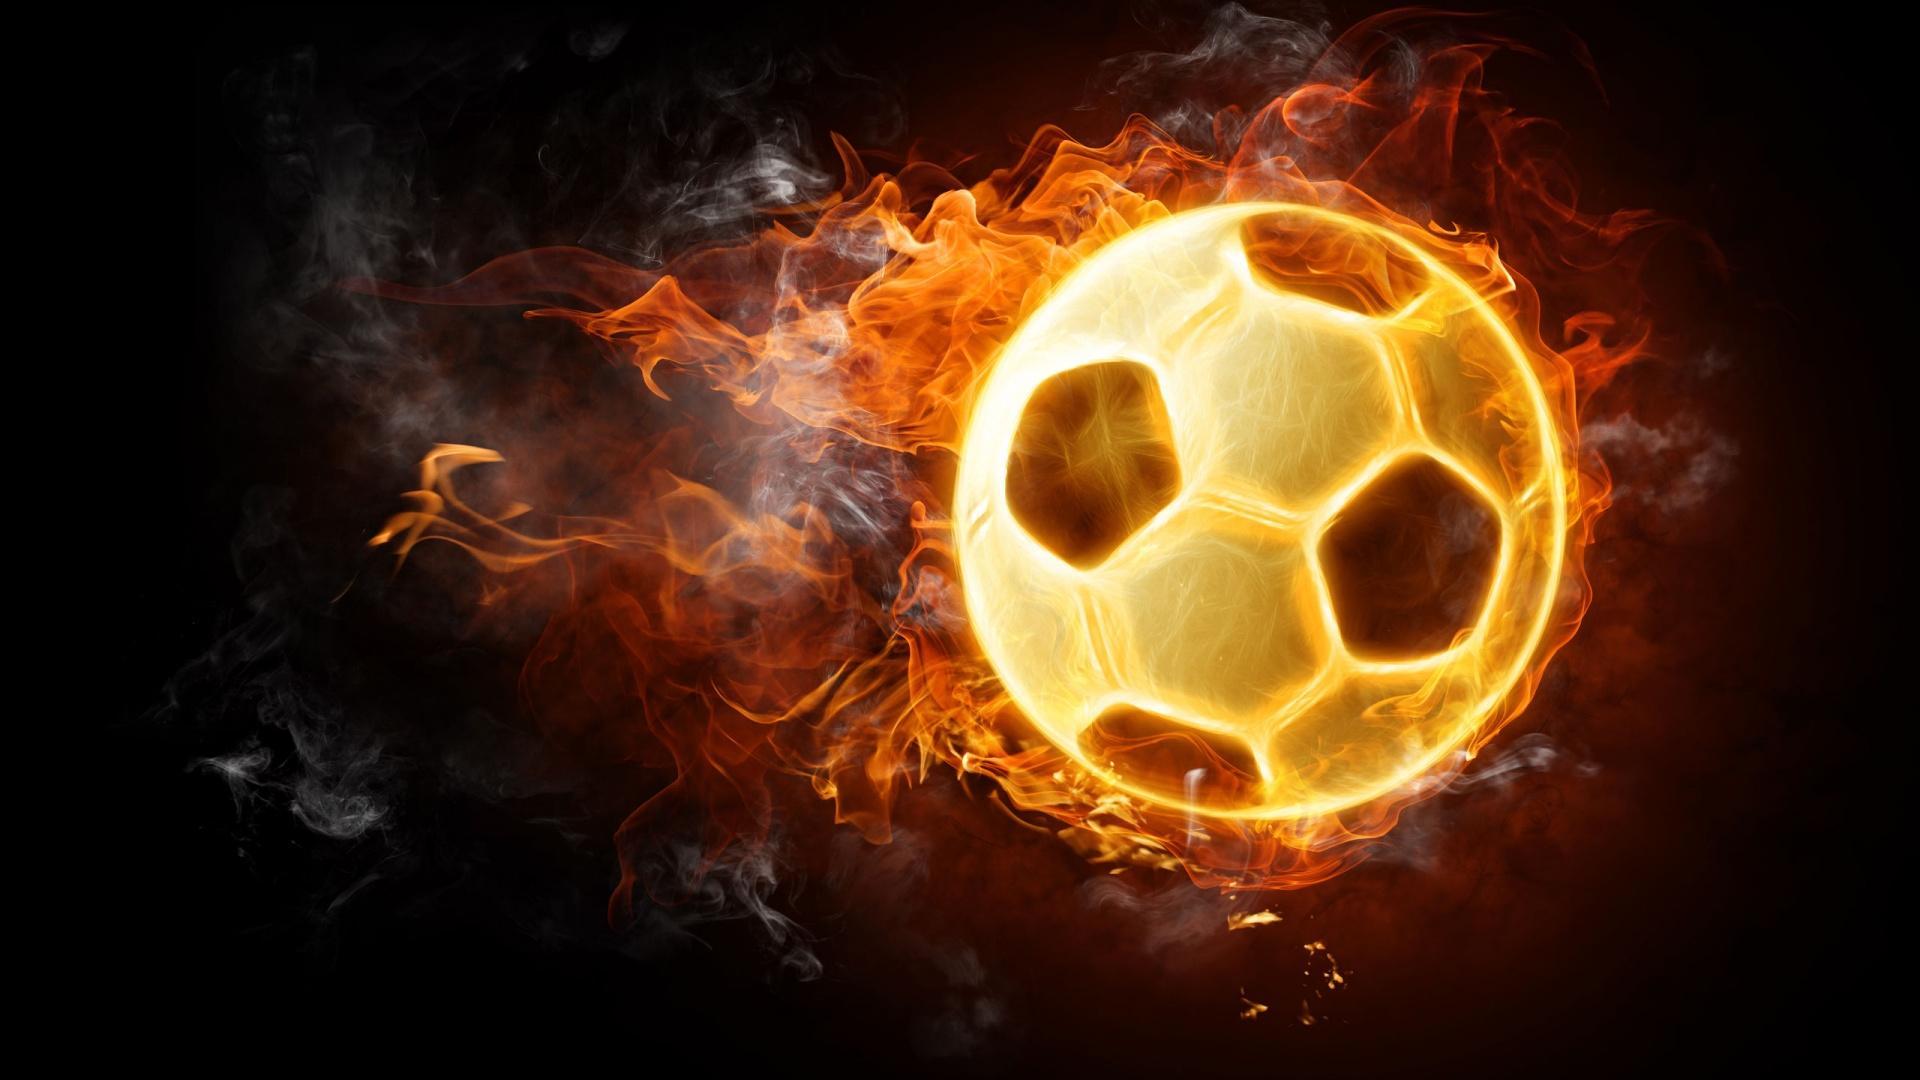 Football on Fire – 1080p HD Wallpaper for Desktop | 해 볼 만한